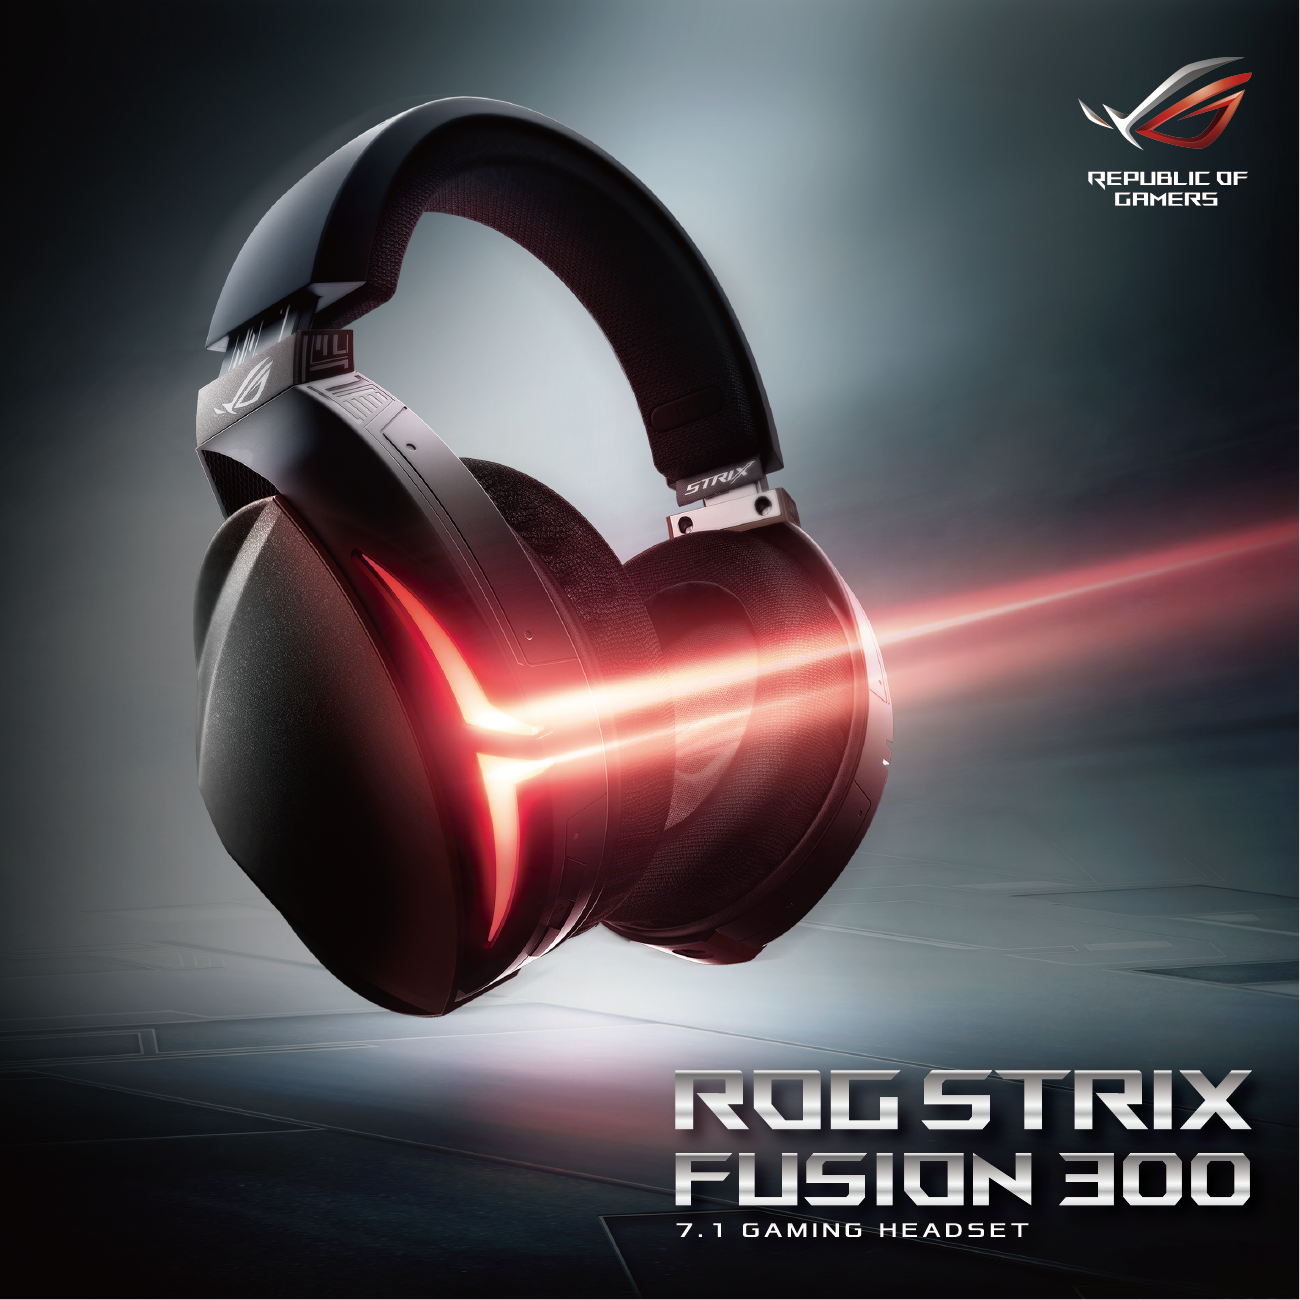 fusion 300